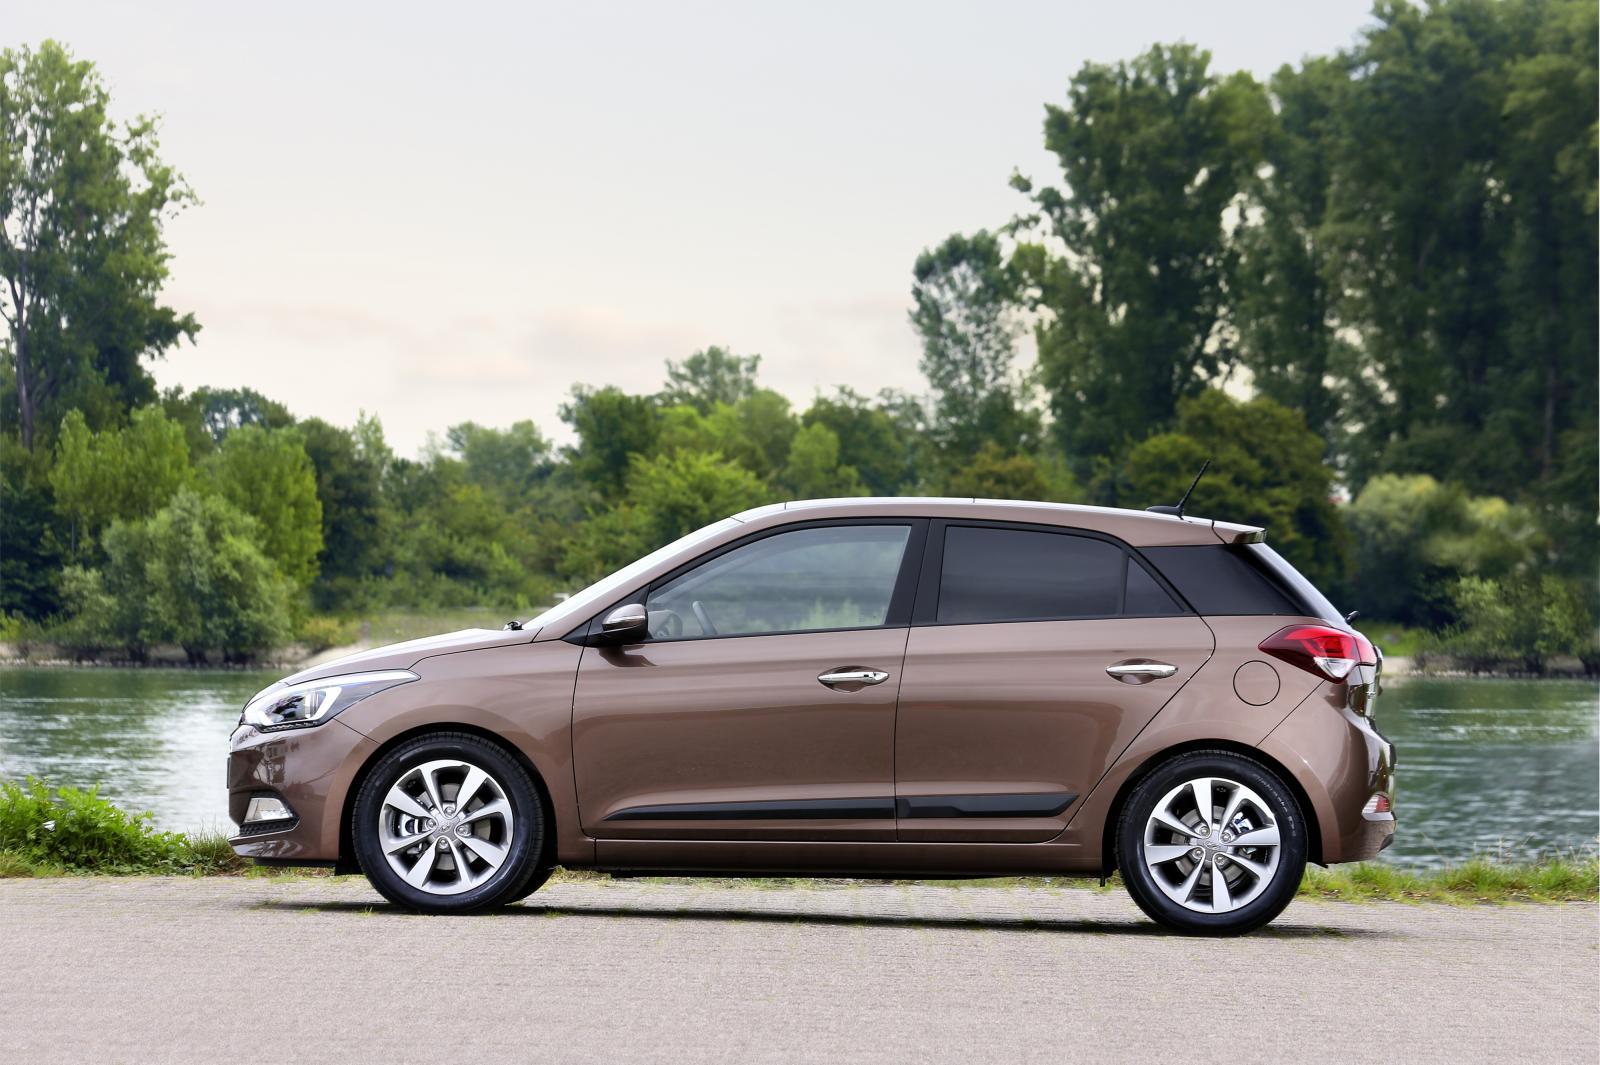 2015 Hyundai i20 Europe press shot side